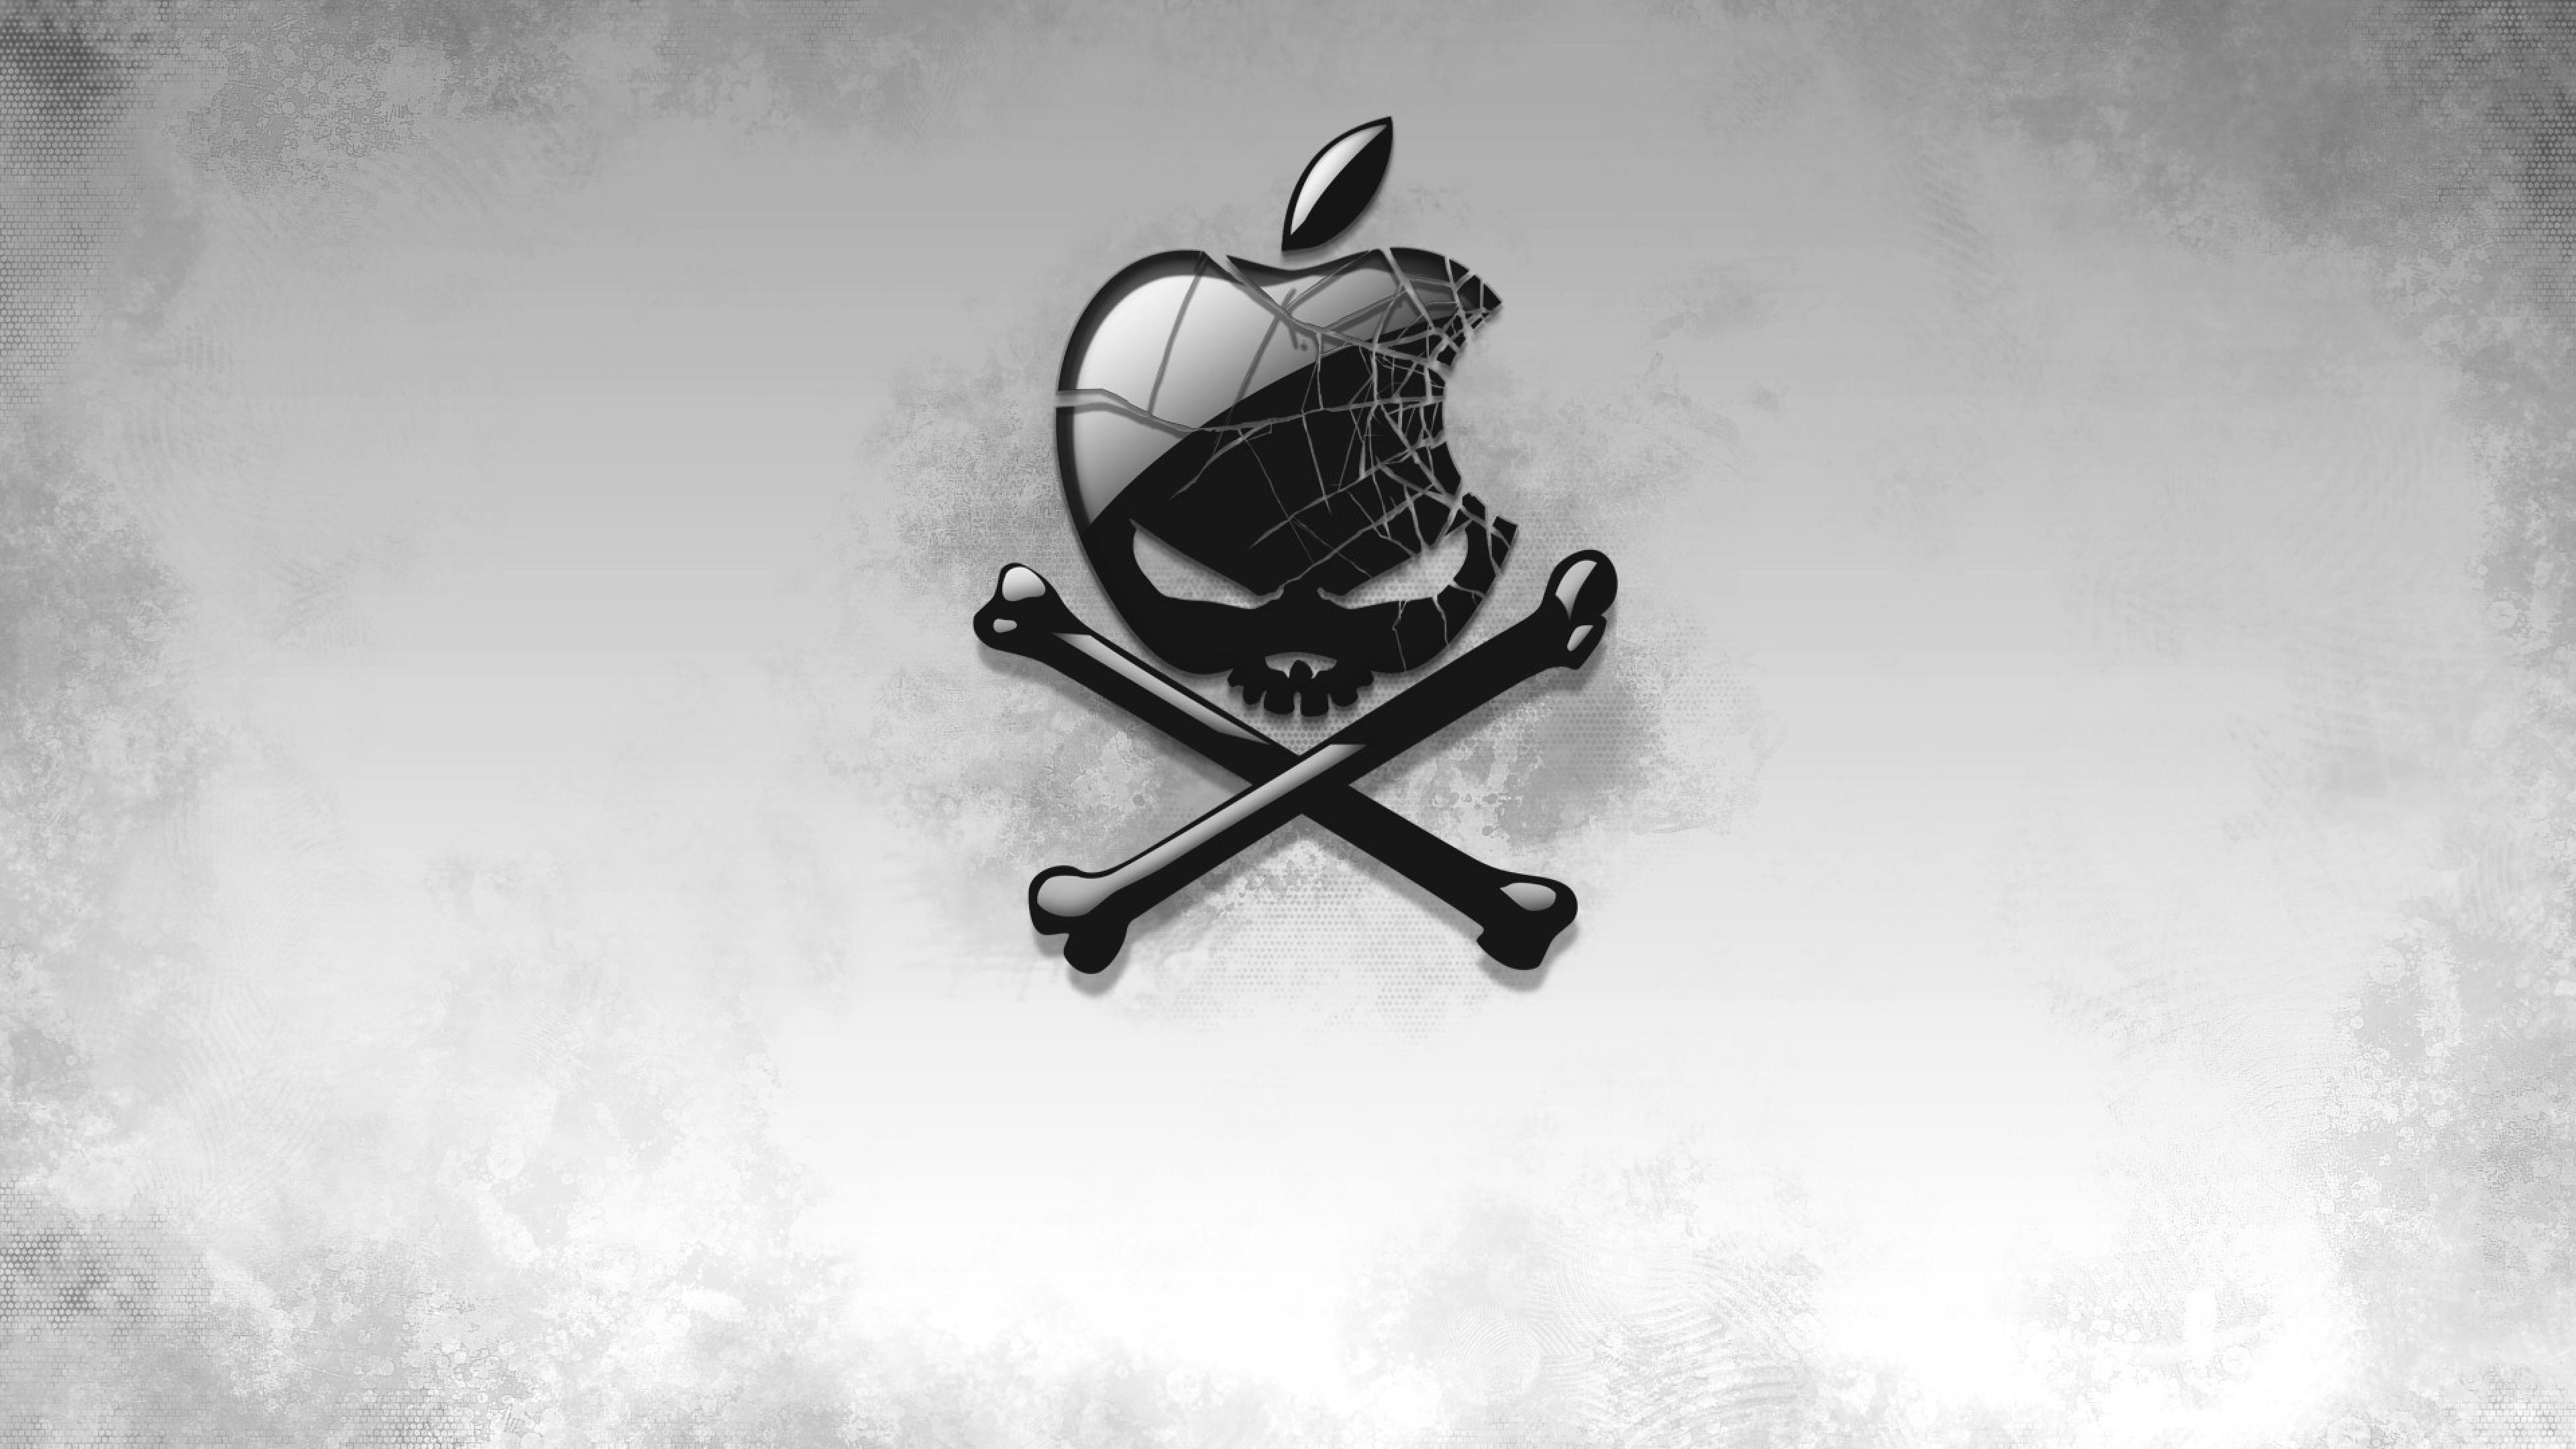 2880x1800 black apple skull macbook pro retina hd 4k wallpapers